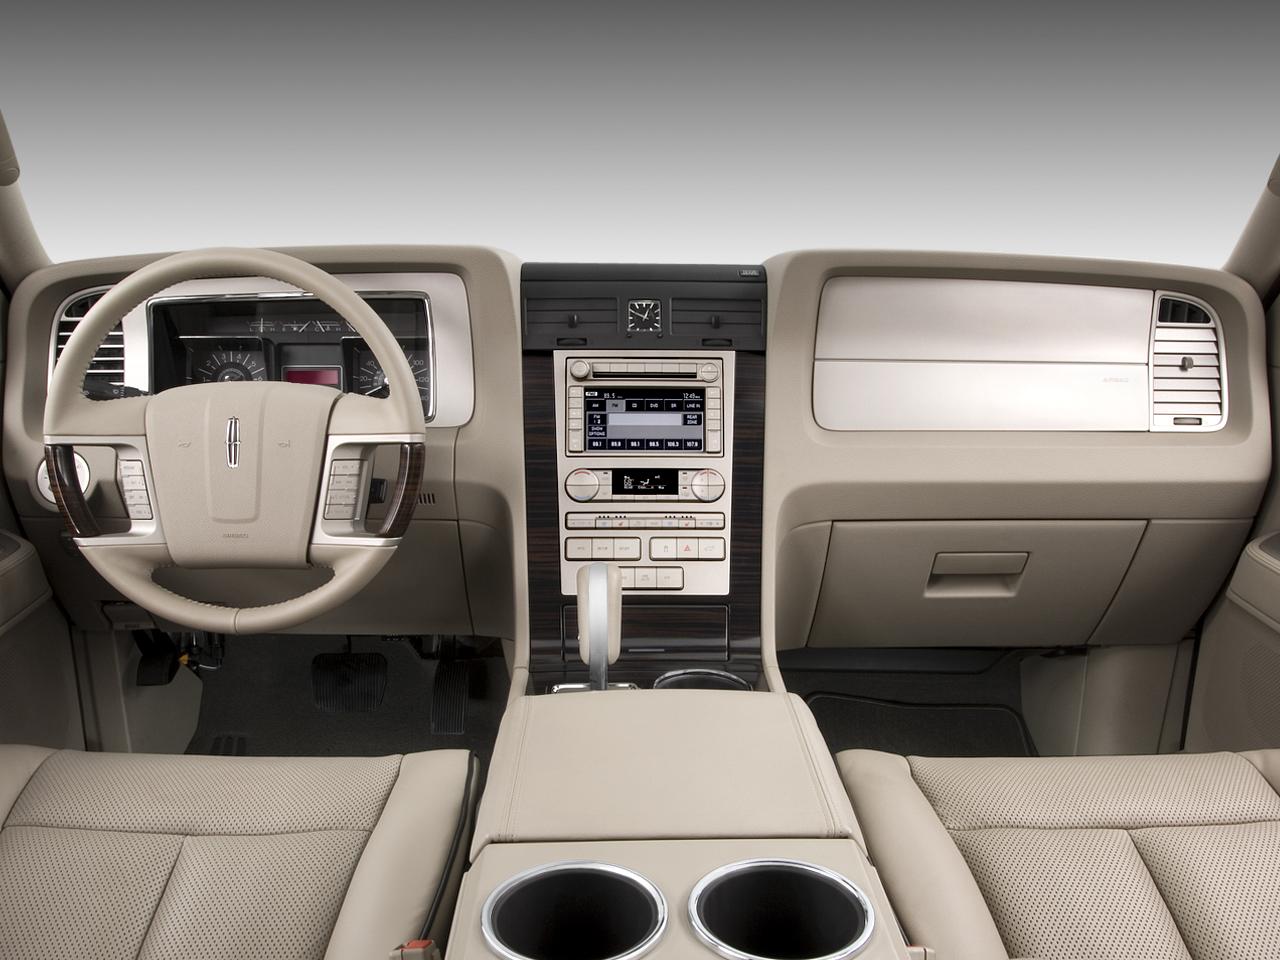 2007 Lincoln Navigator and Navigator L - 2007 New Cars - Automobile ...